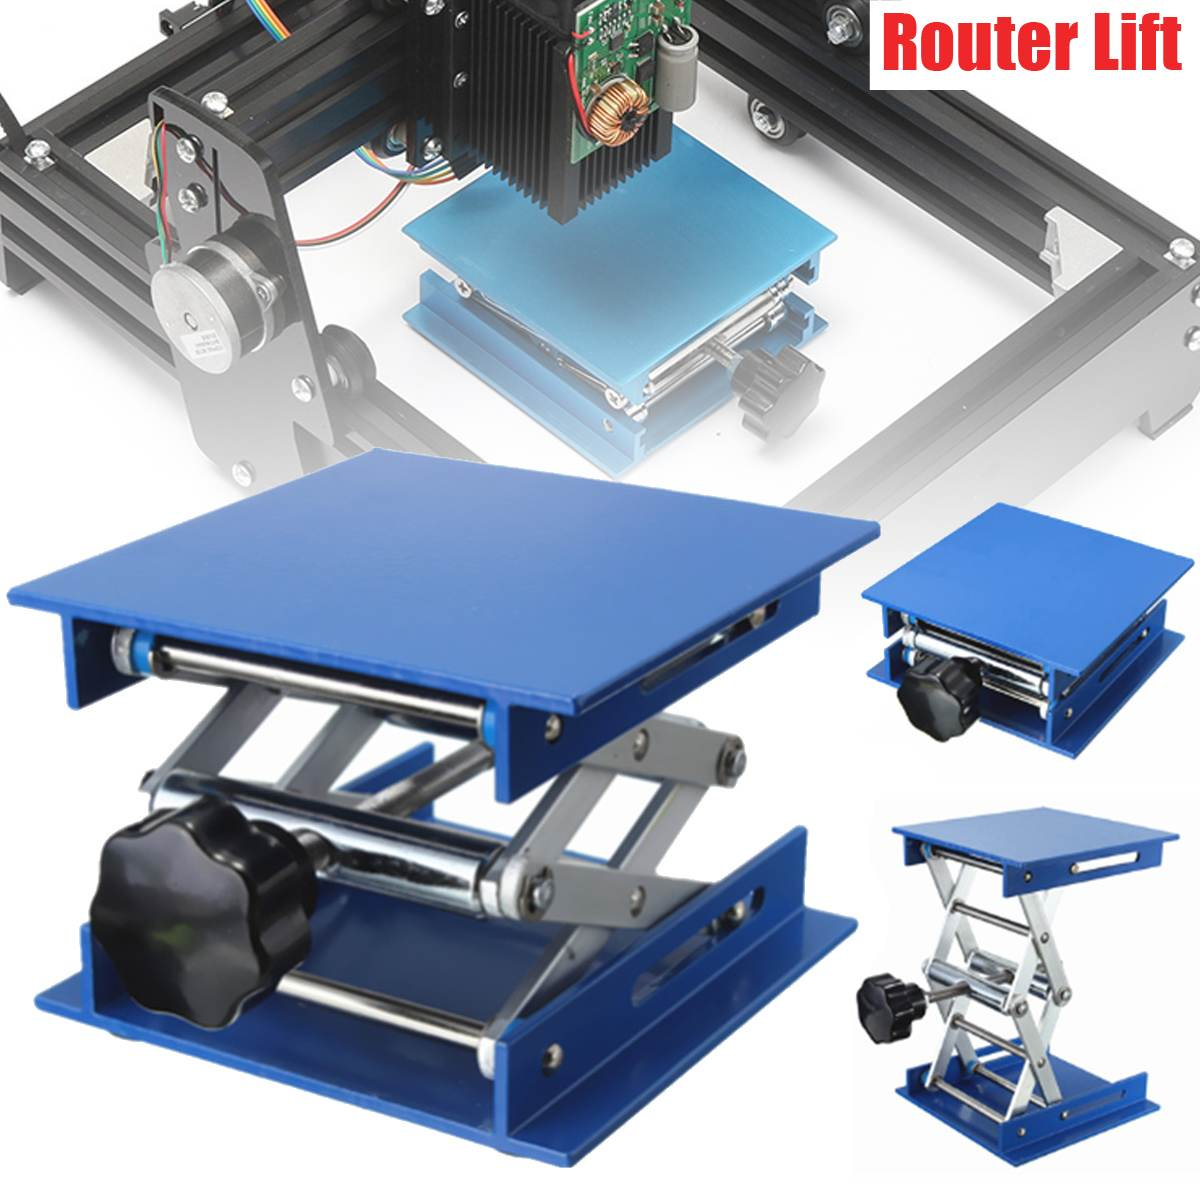 Stainless Steel Laboratory Lifting Platform Stand Rack Scissor Lab-Lifting Aluminum Oxide Manual Control 100X100X150MM